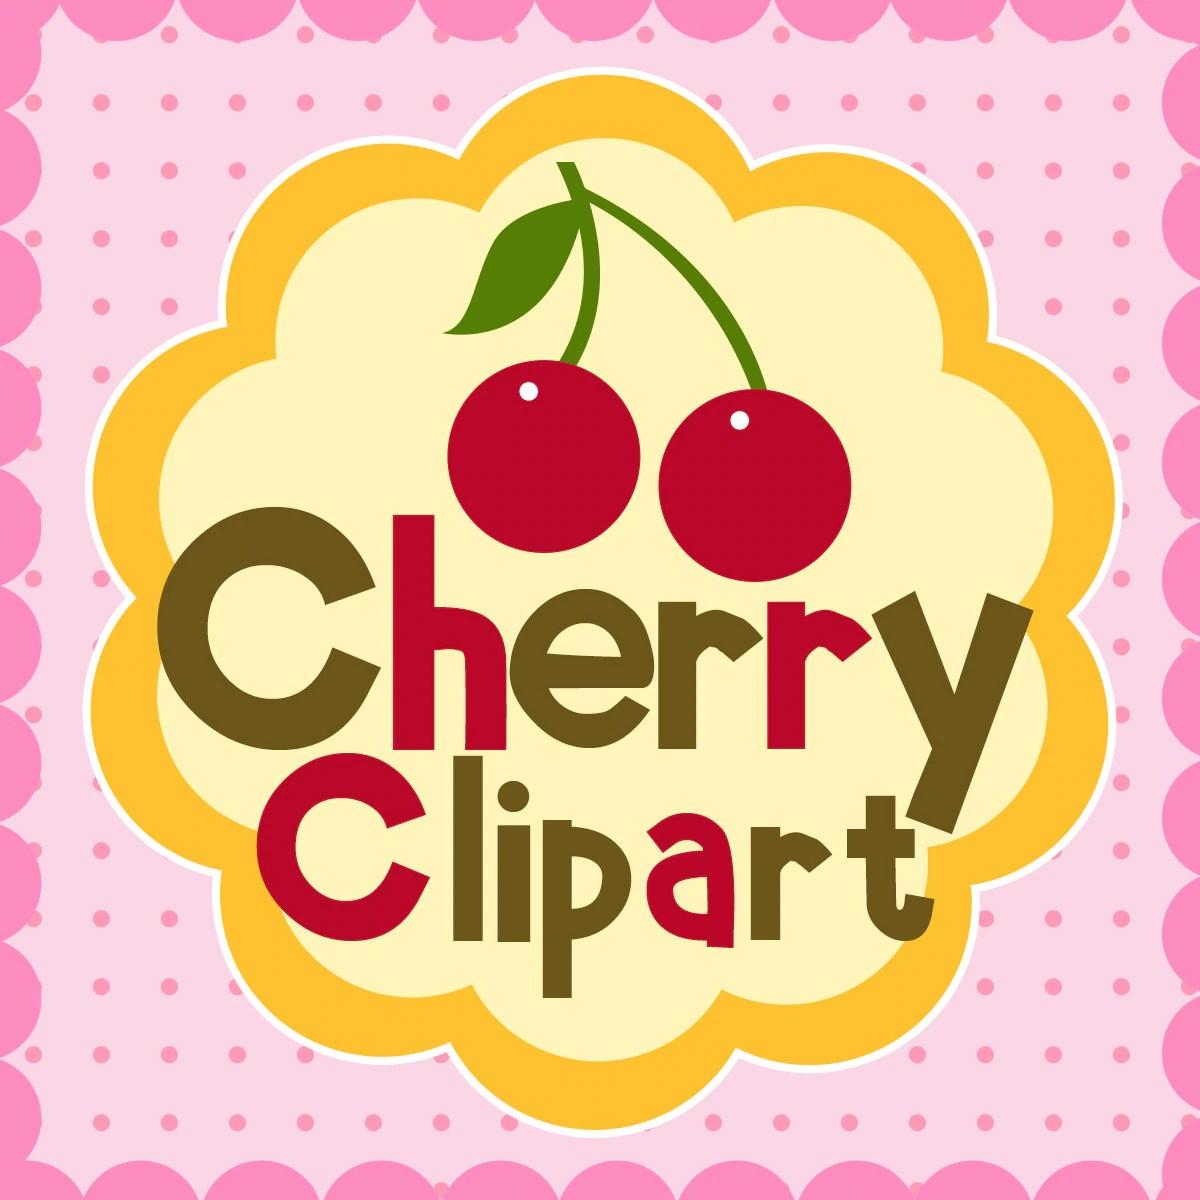 cherry clipart [ 1200 x 1200 Pixel ]